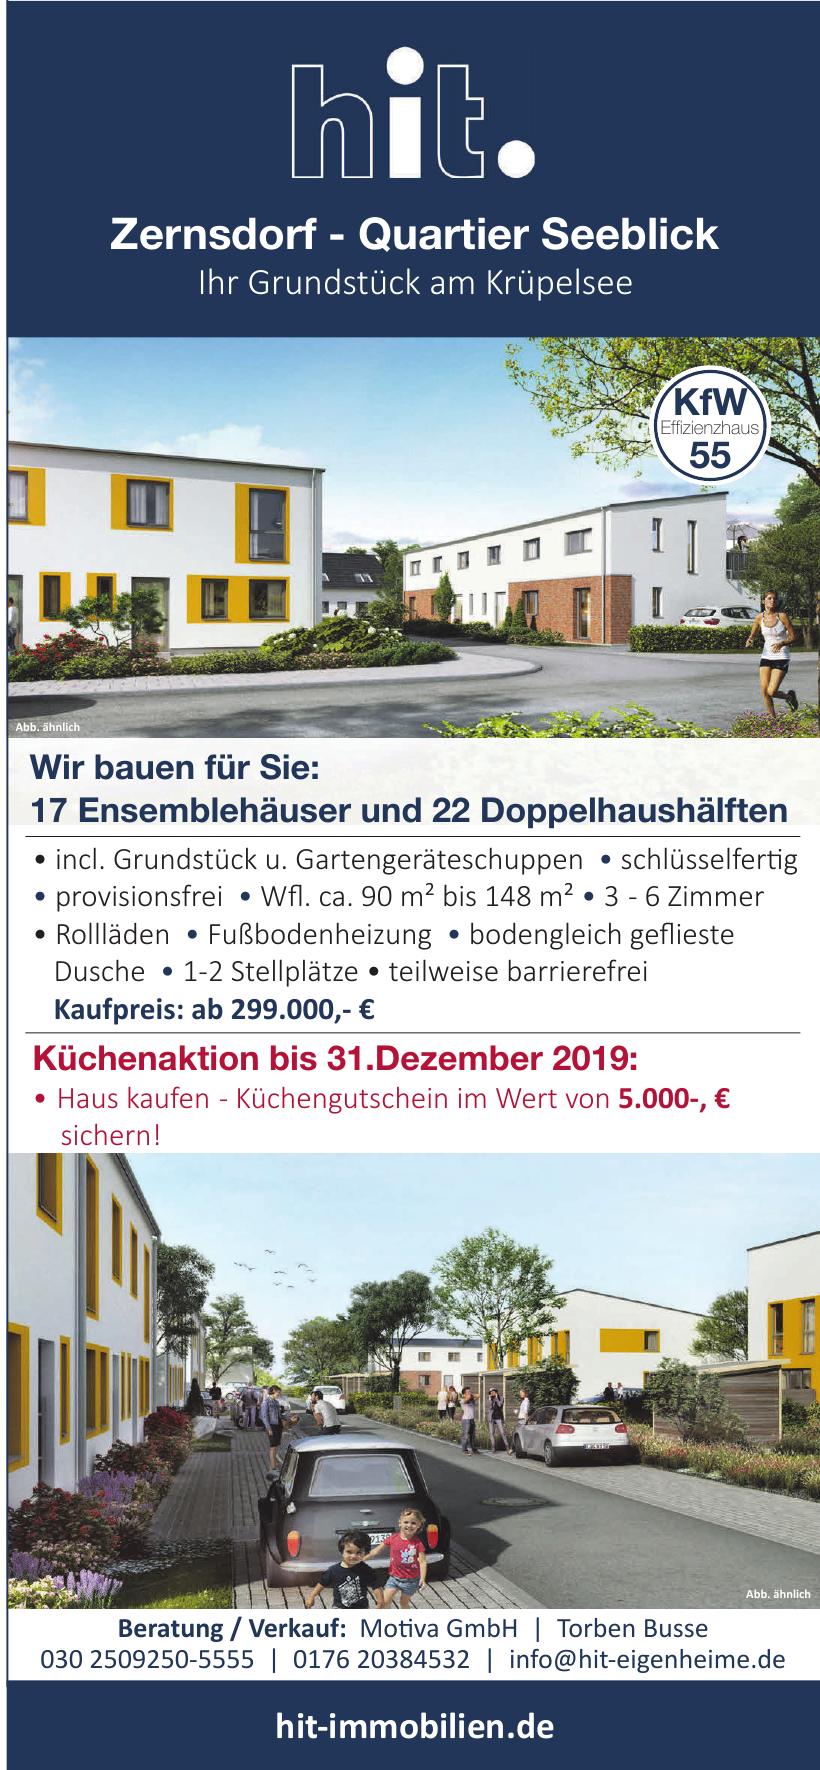 Motiva GmbH